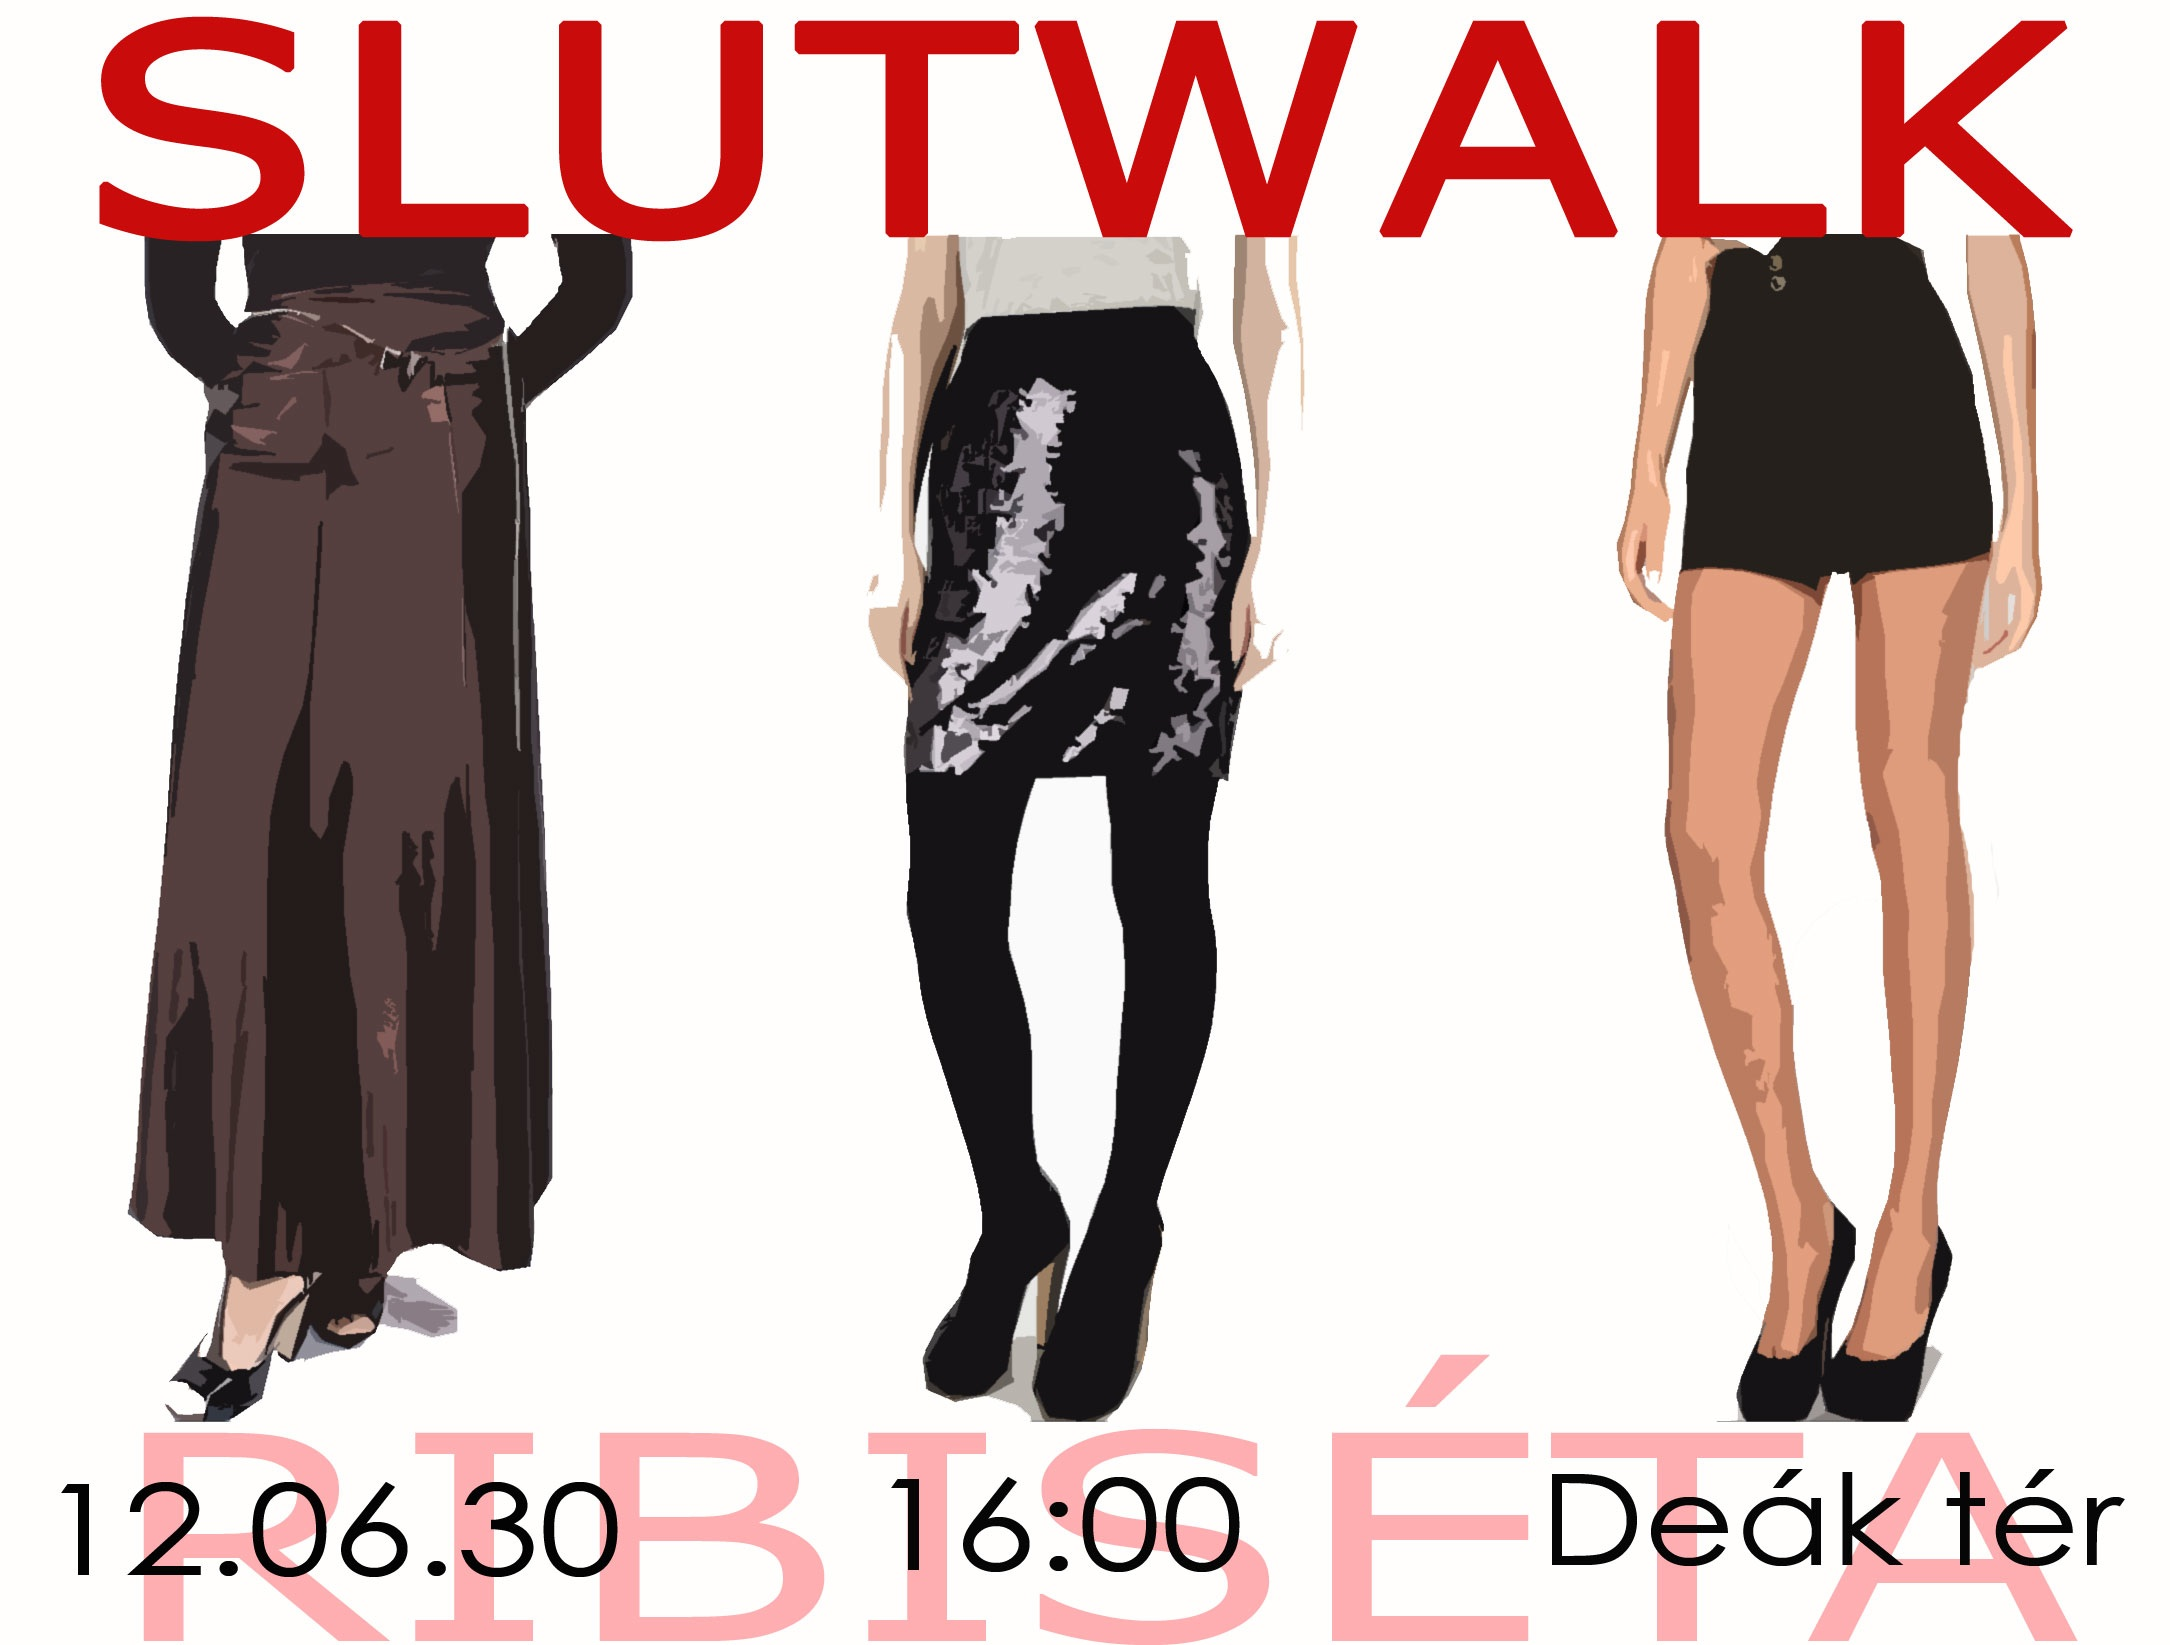 slutwalk logó 2012.jpg